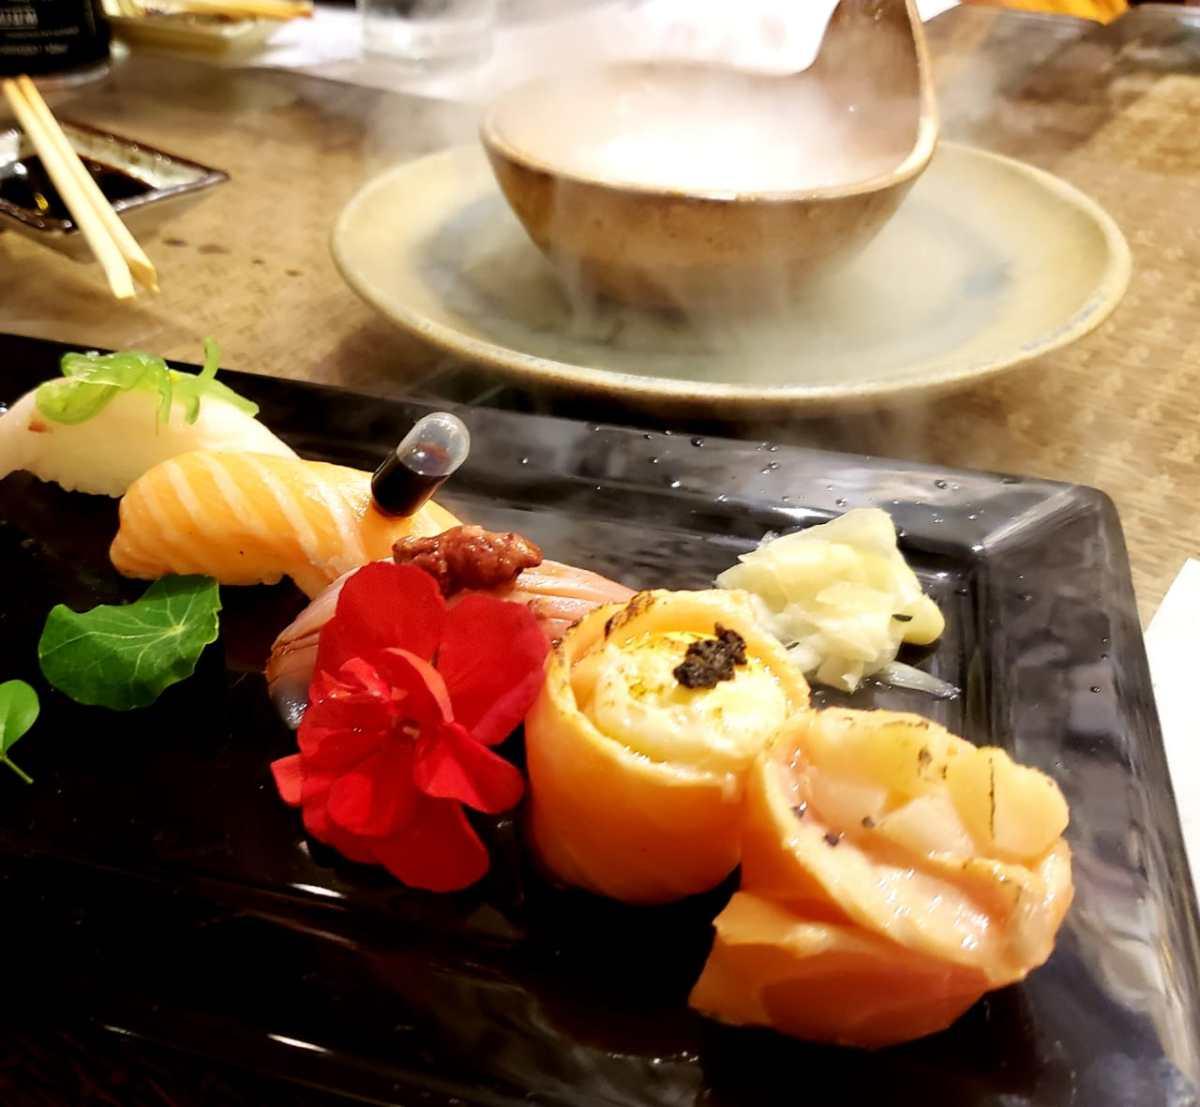 Omakase, toda terça no Tatibana, uma experiência gastronômica